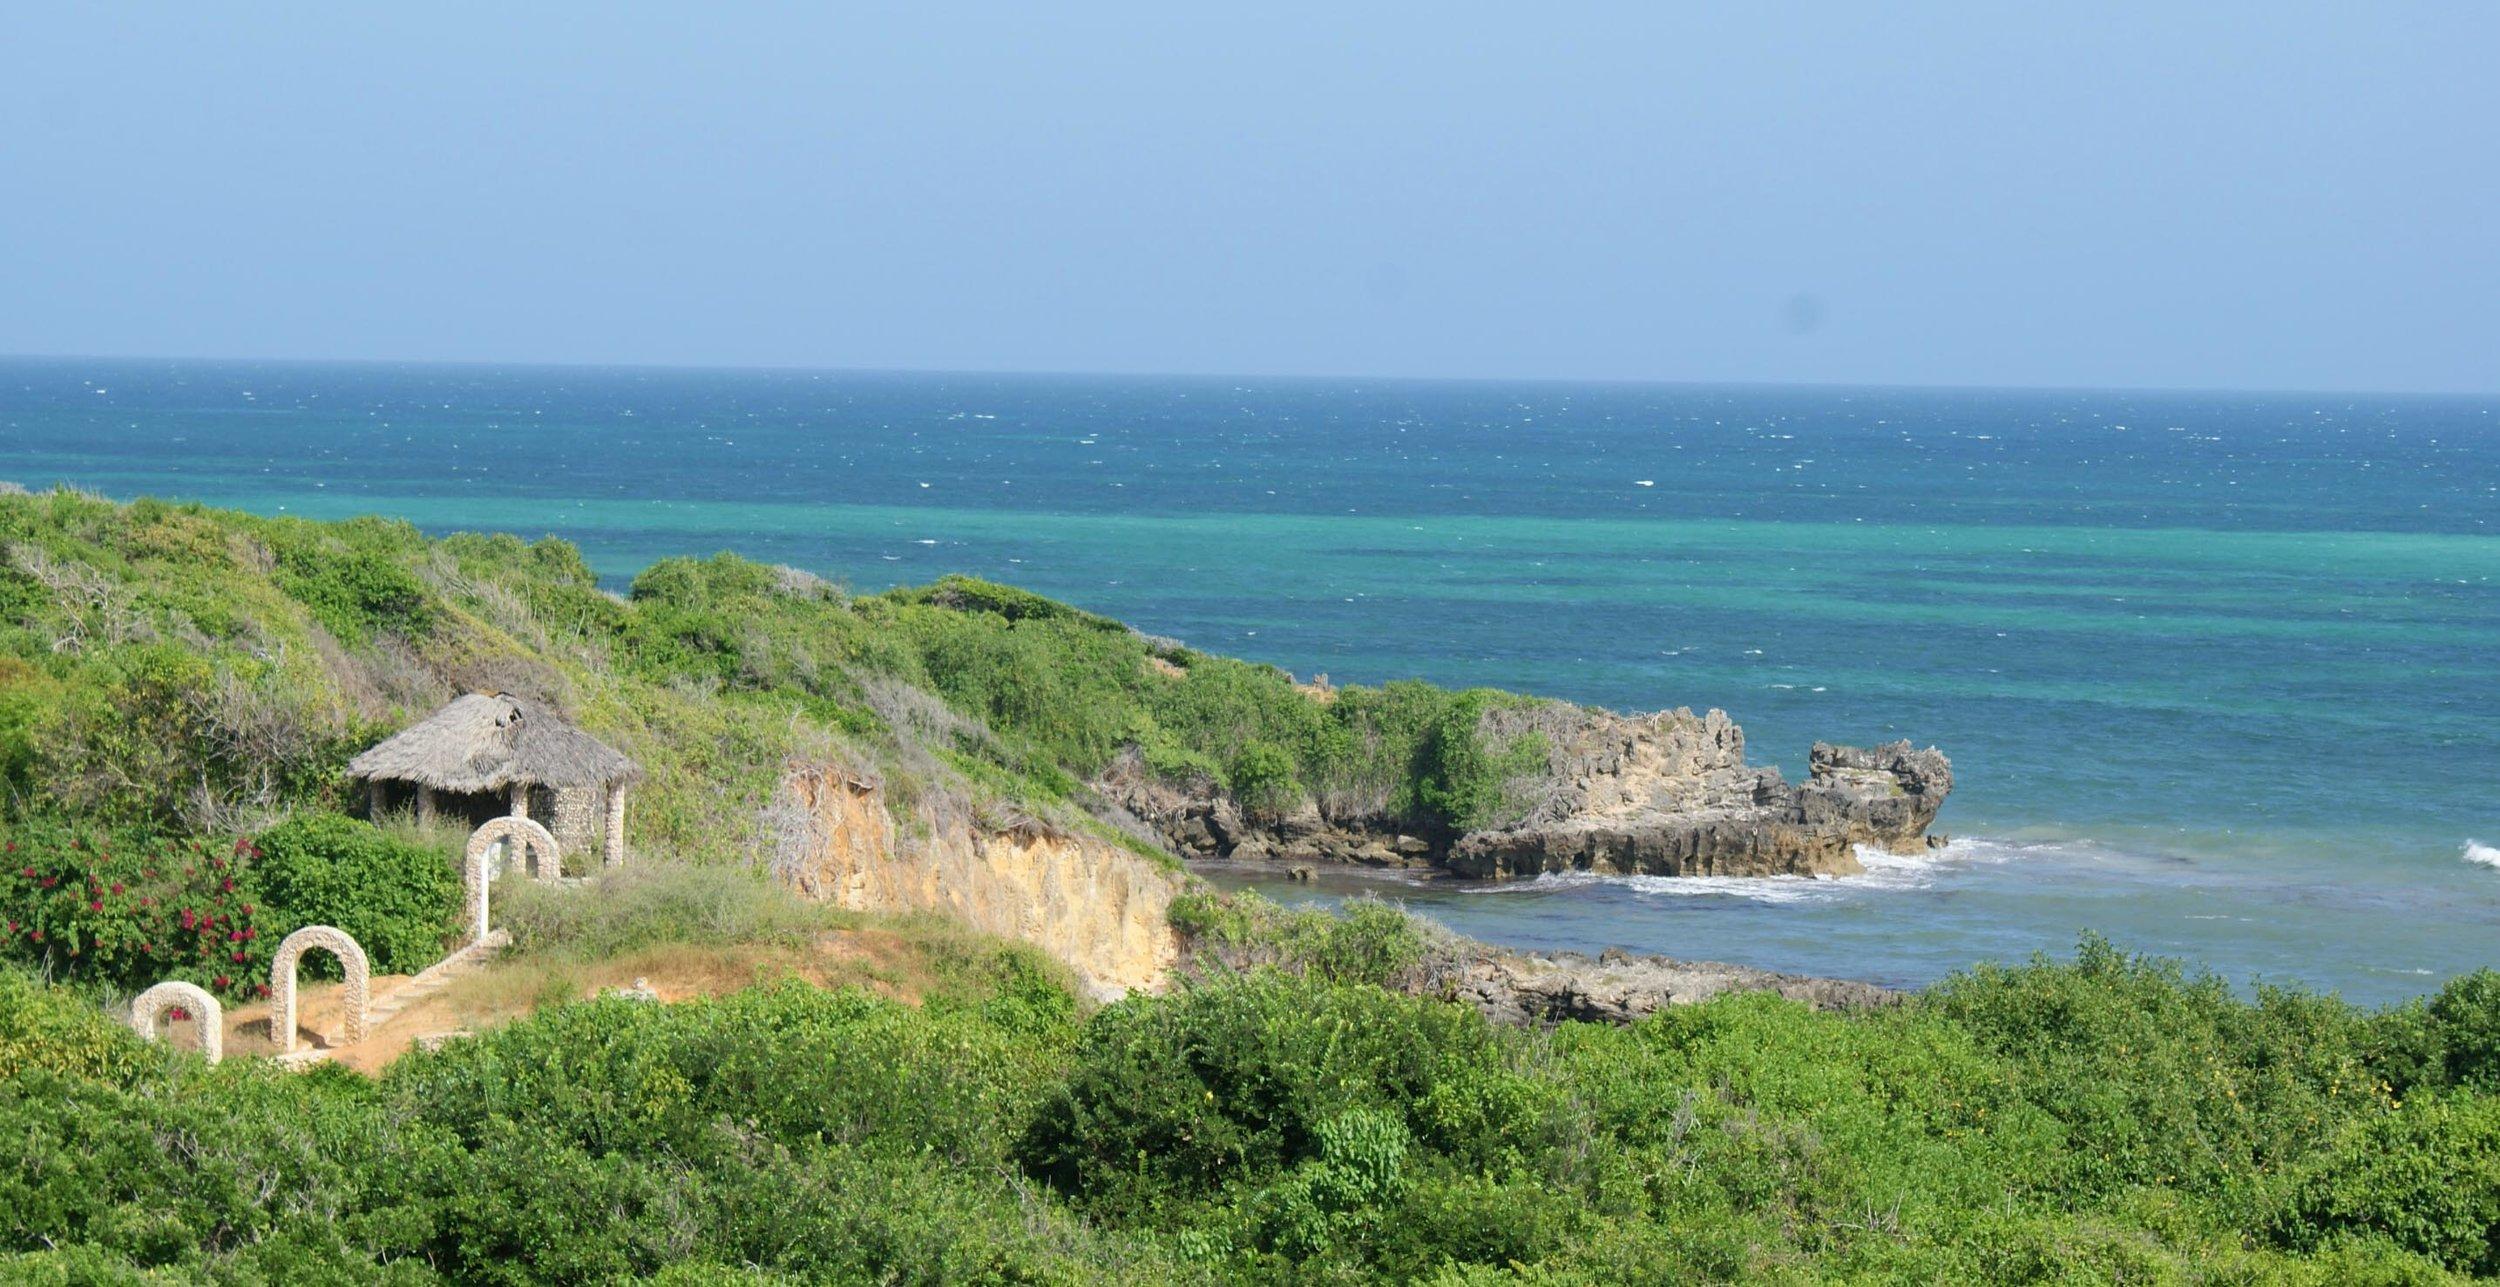 kusini-seaview.jpg